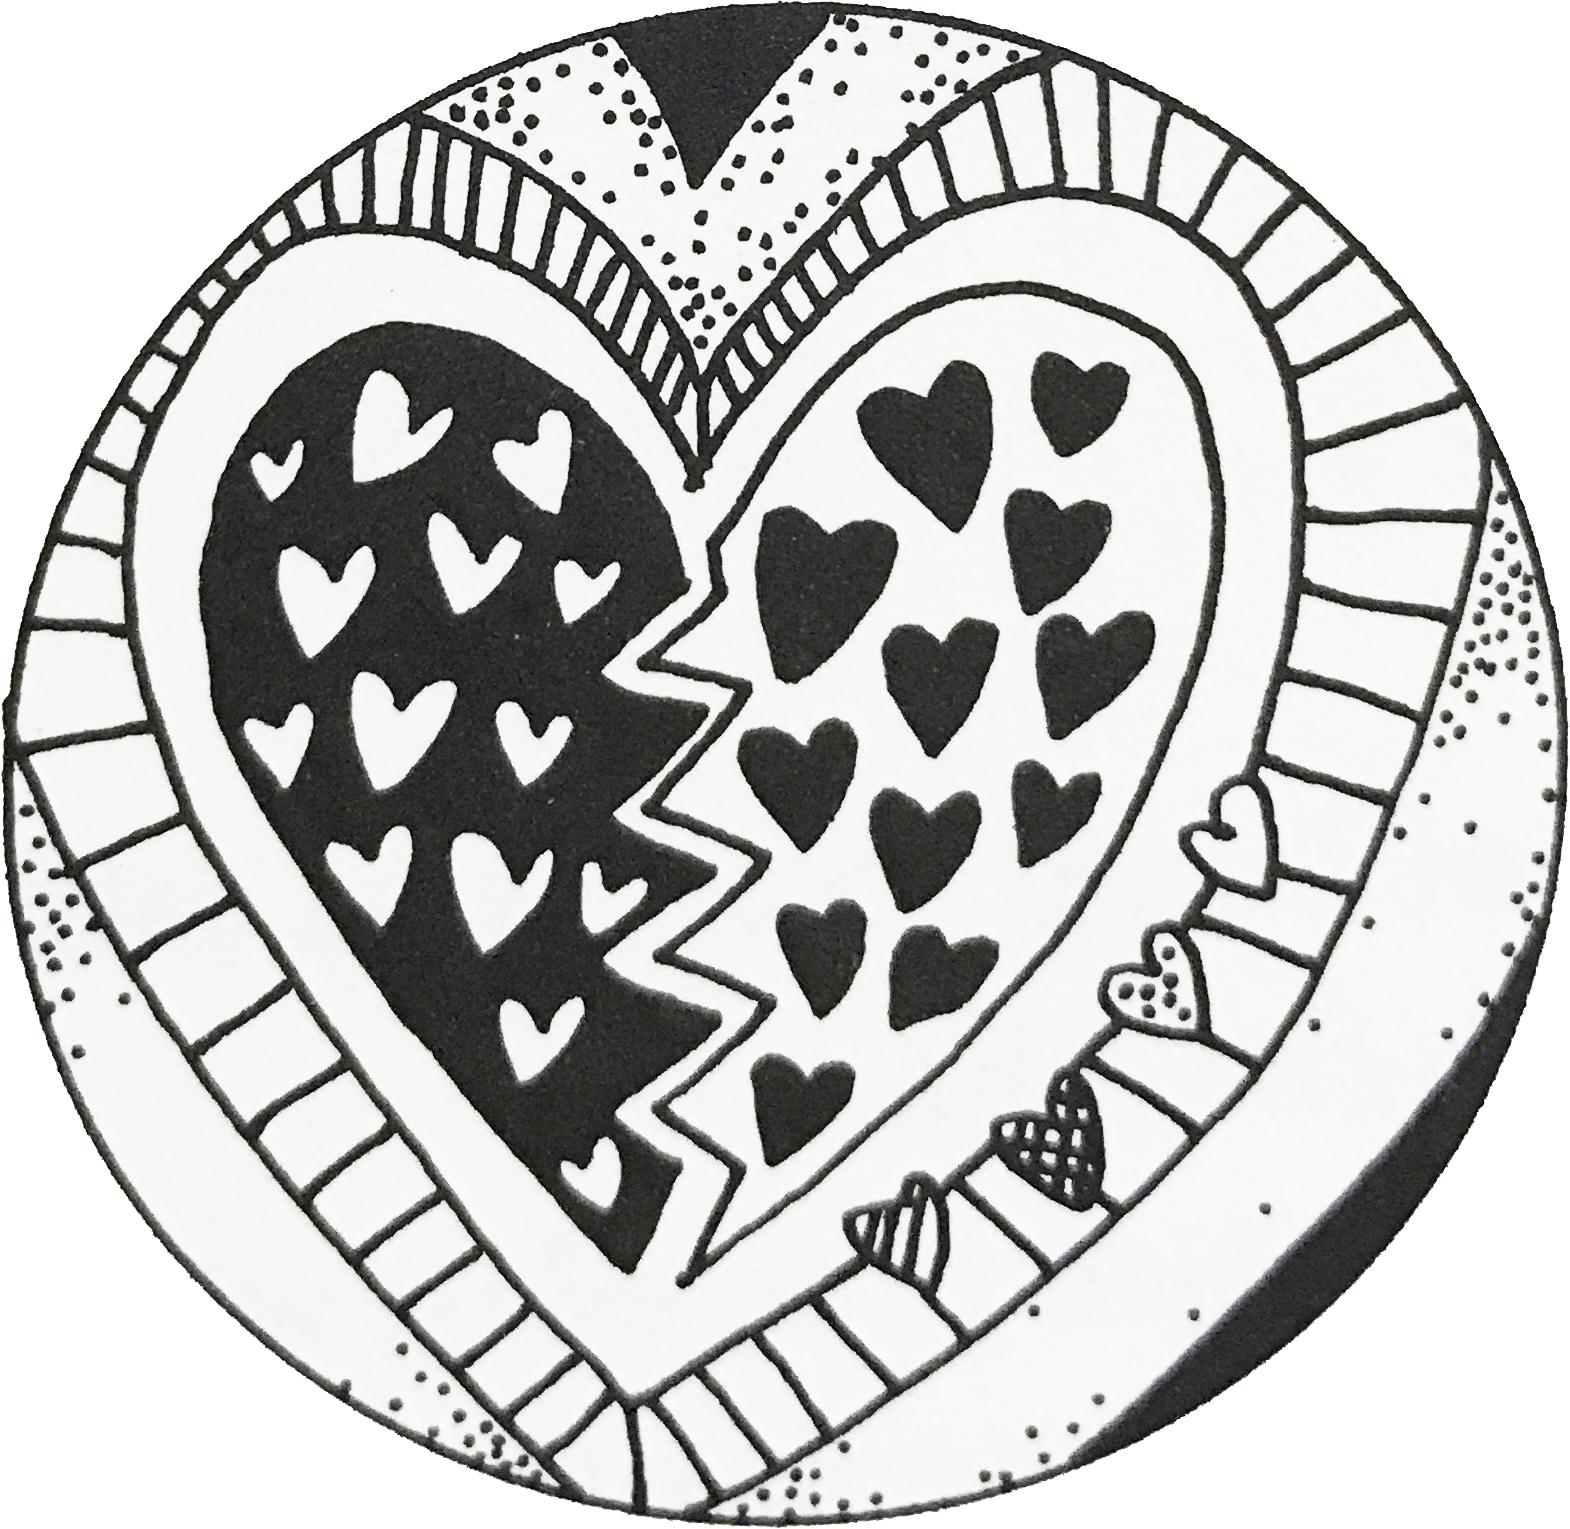 Open Secrets and Breaking Hearts